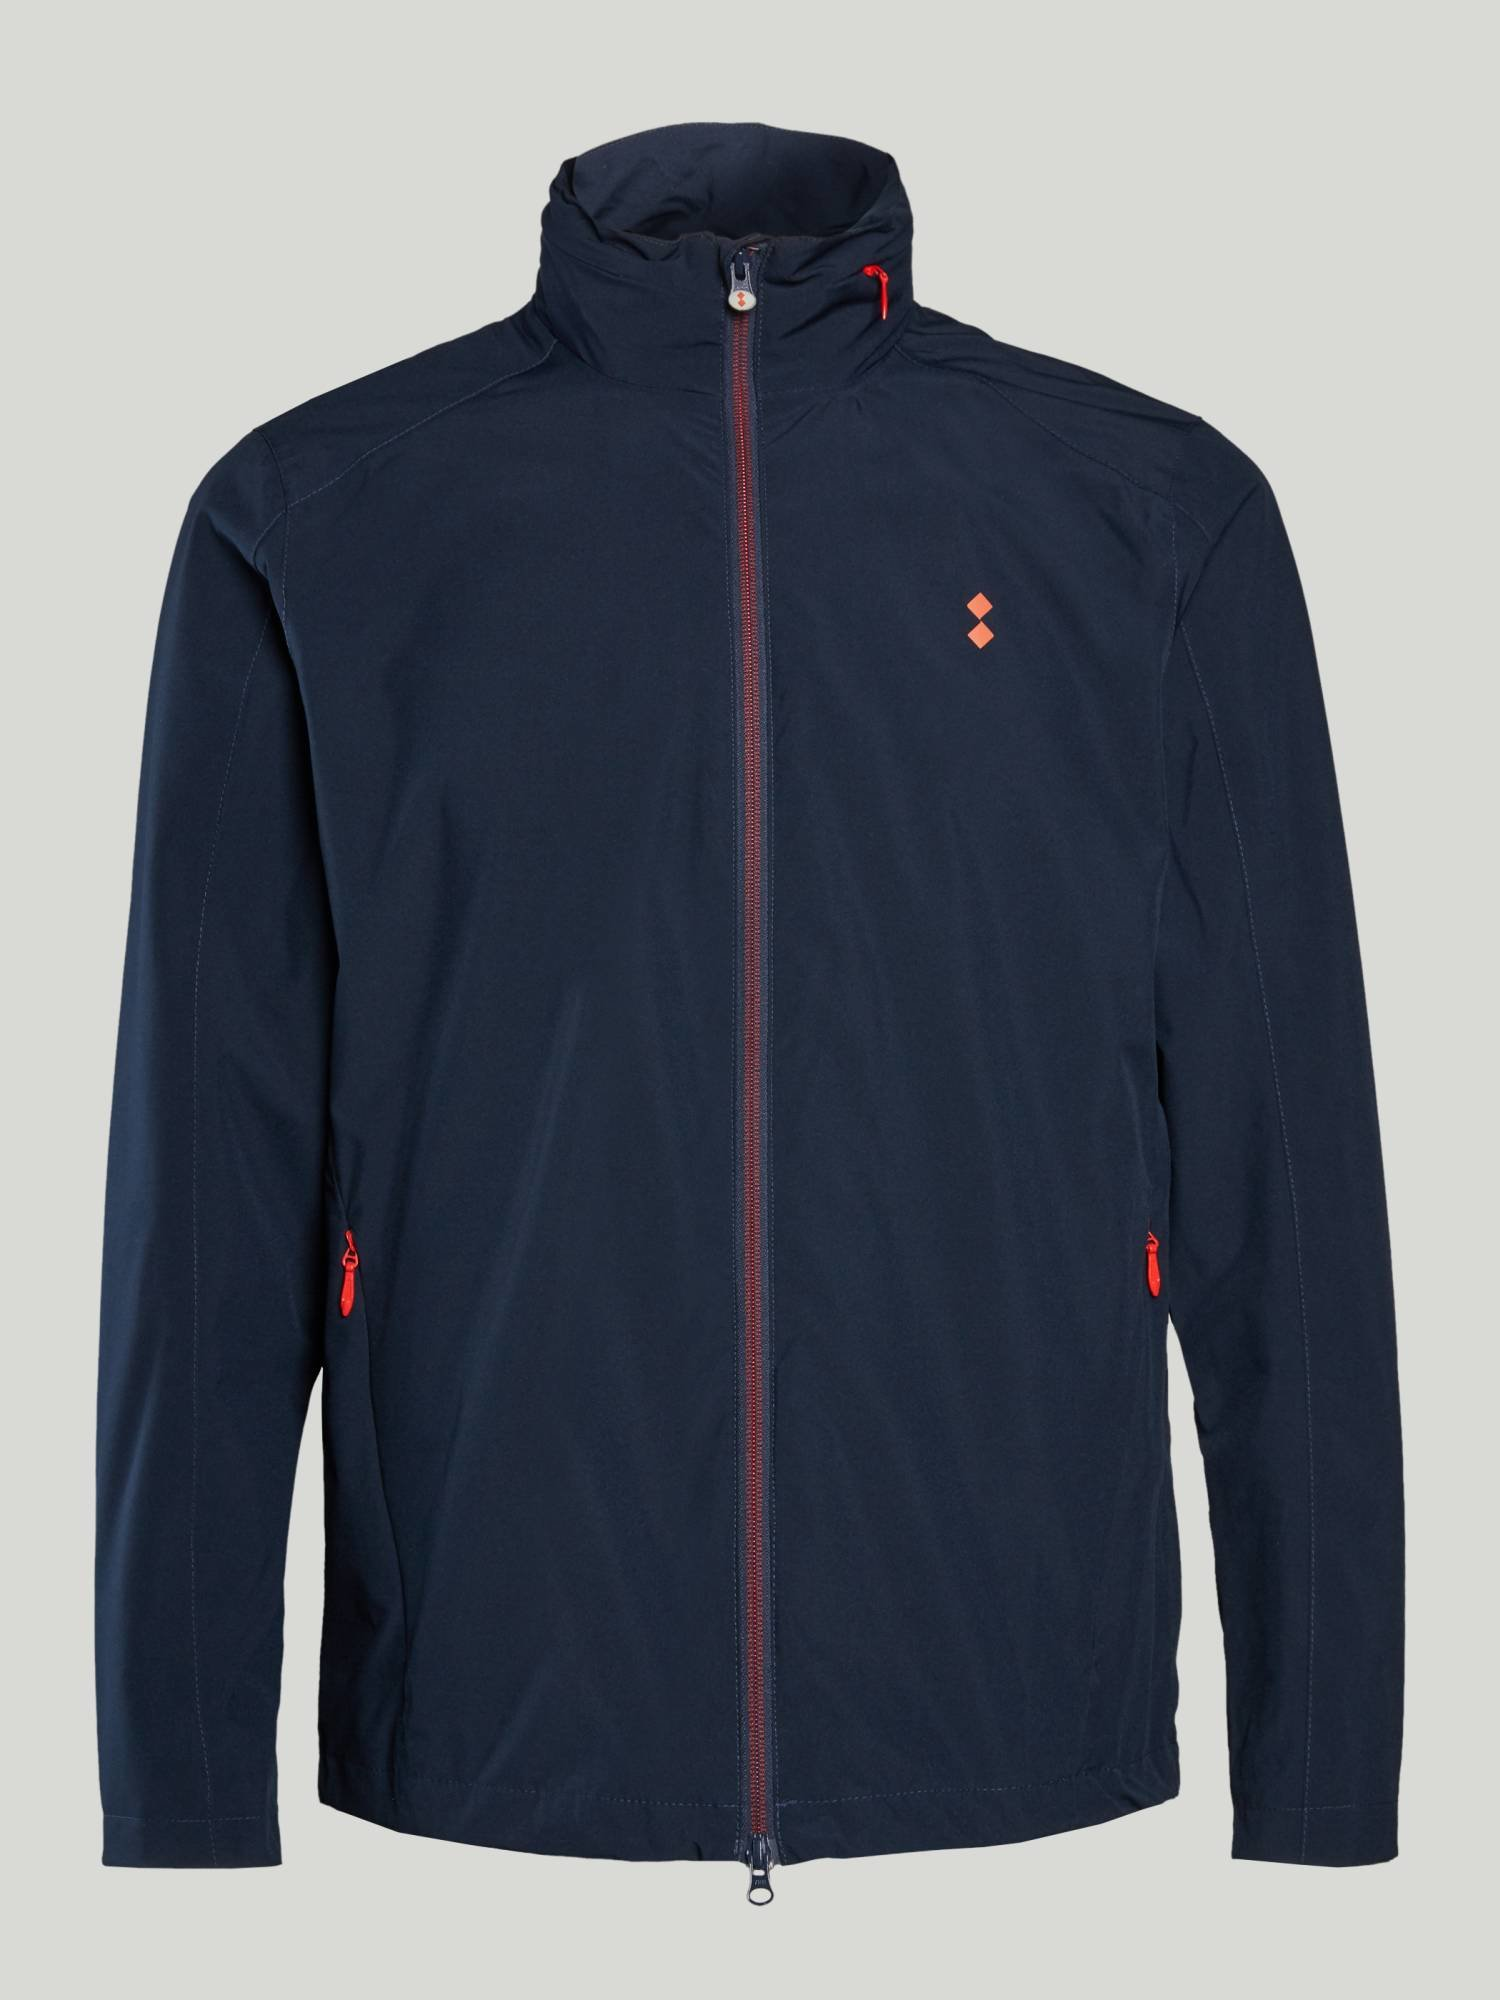 Jacket A214 - Marinenblau